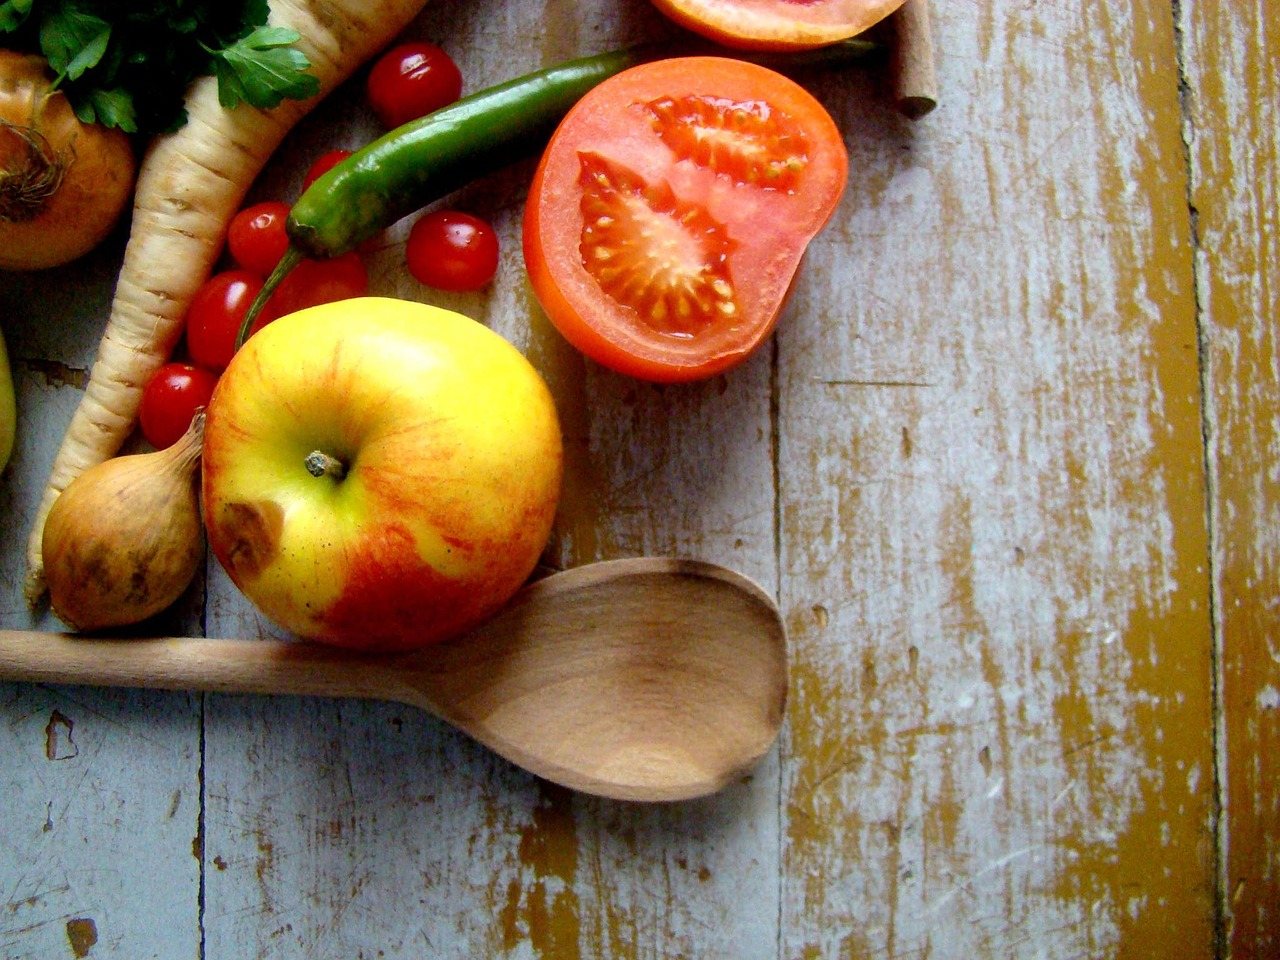 vegetables-2461498_1280.jpg